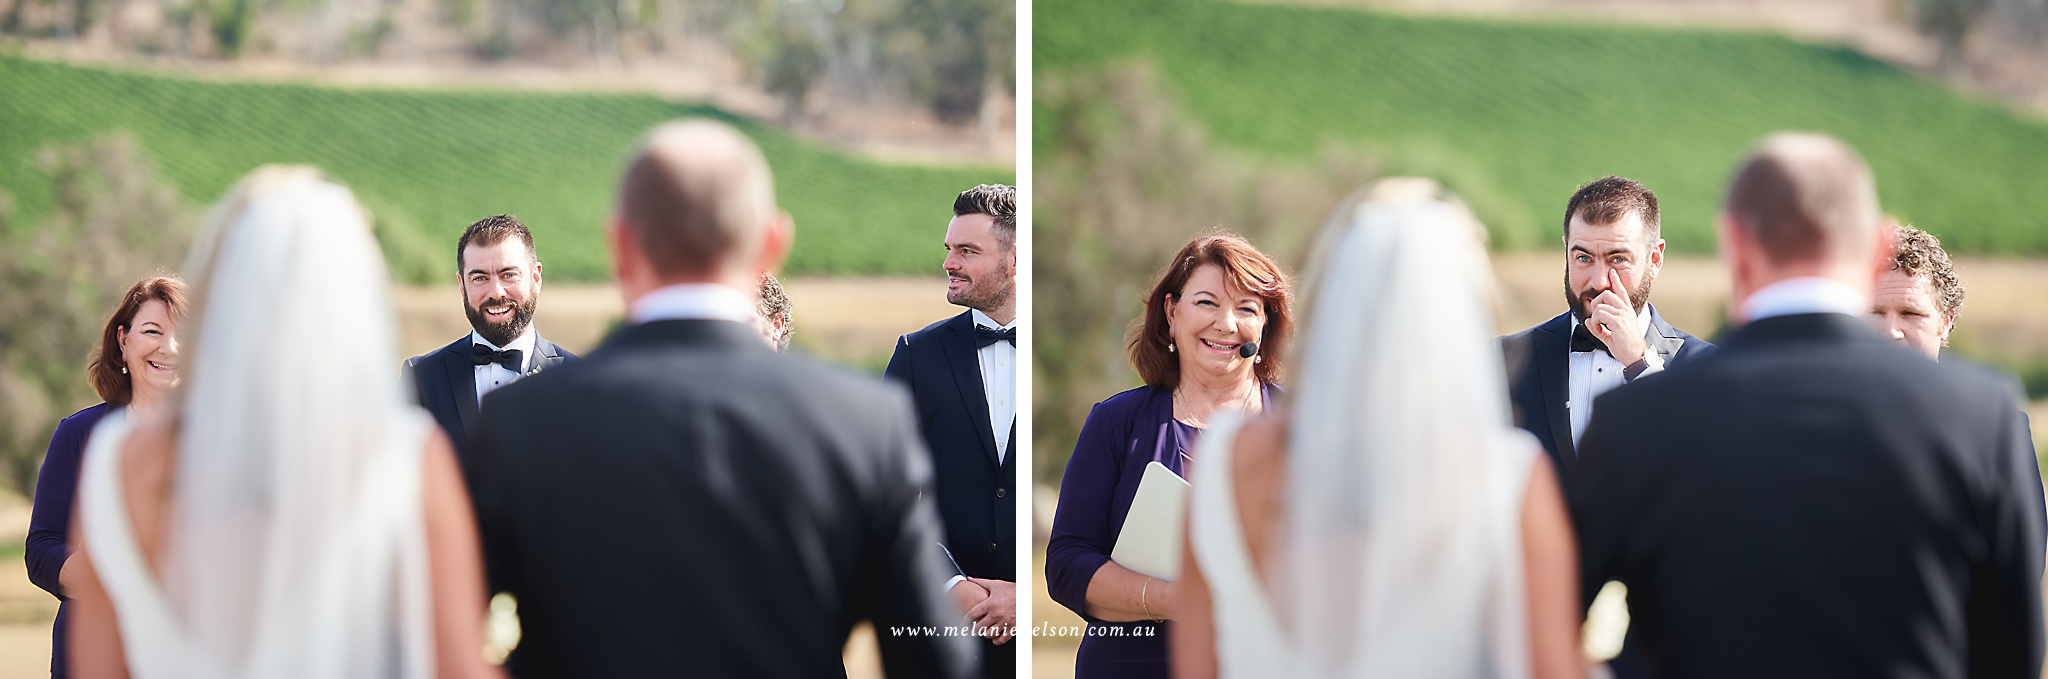 longview_vineyard_wedding_0038.jpg